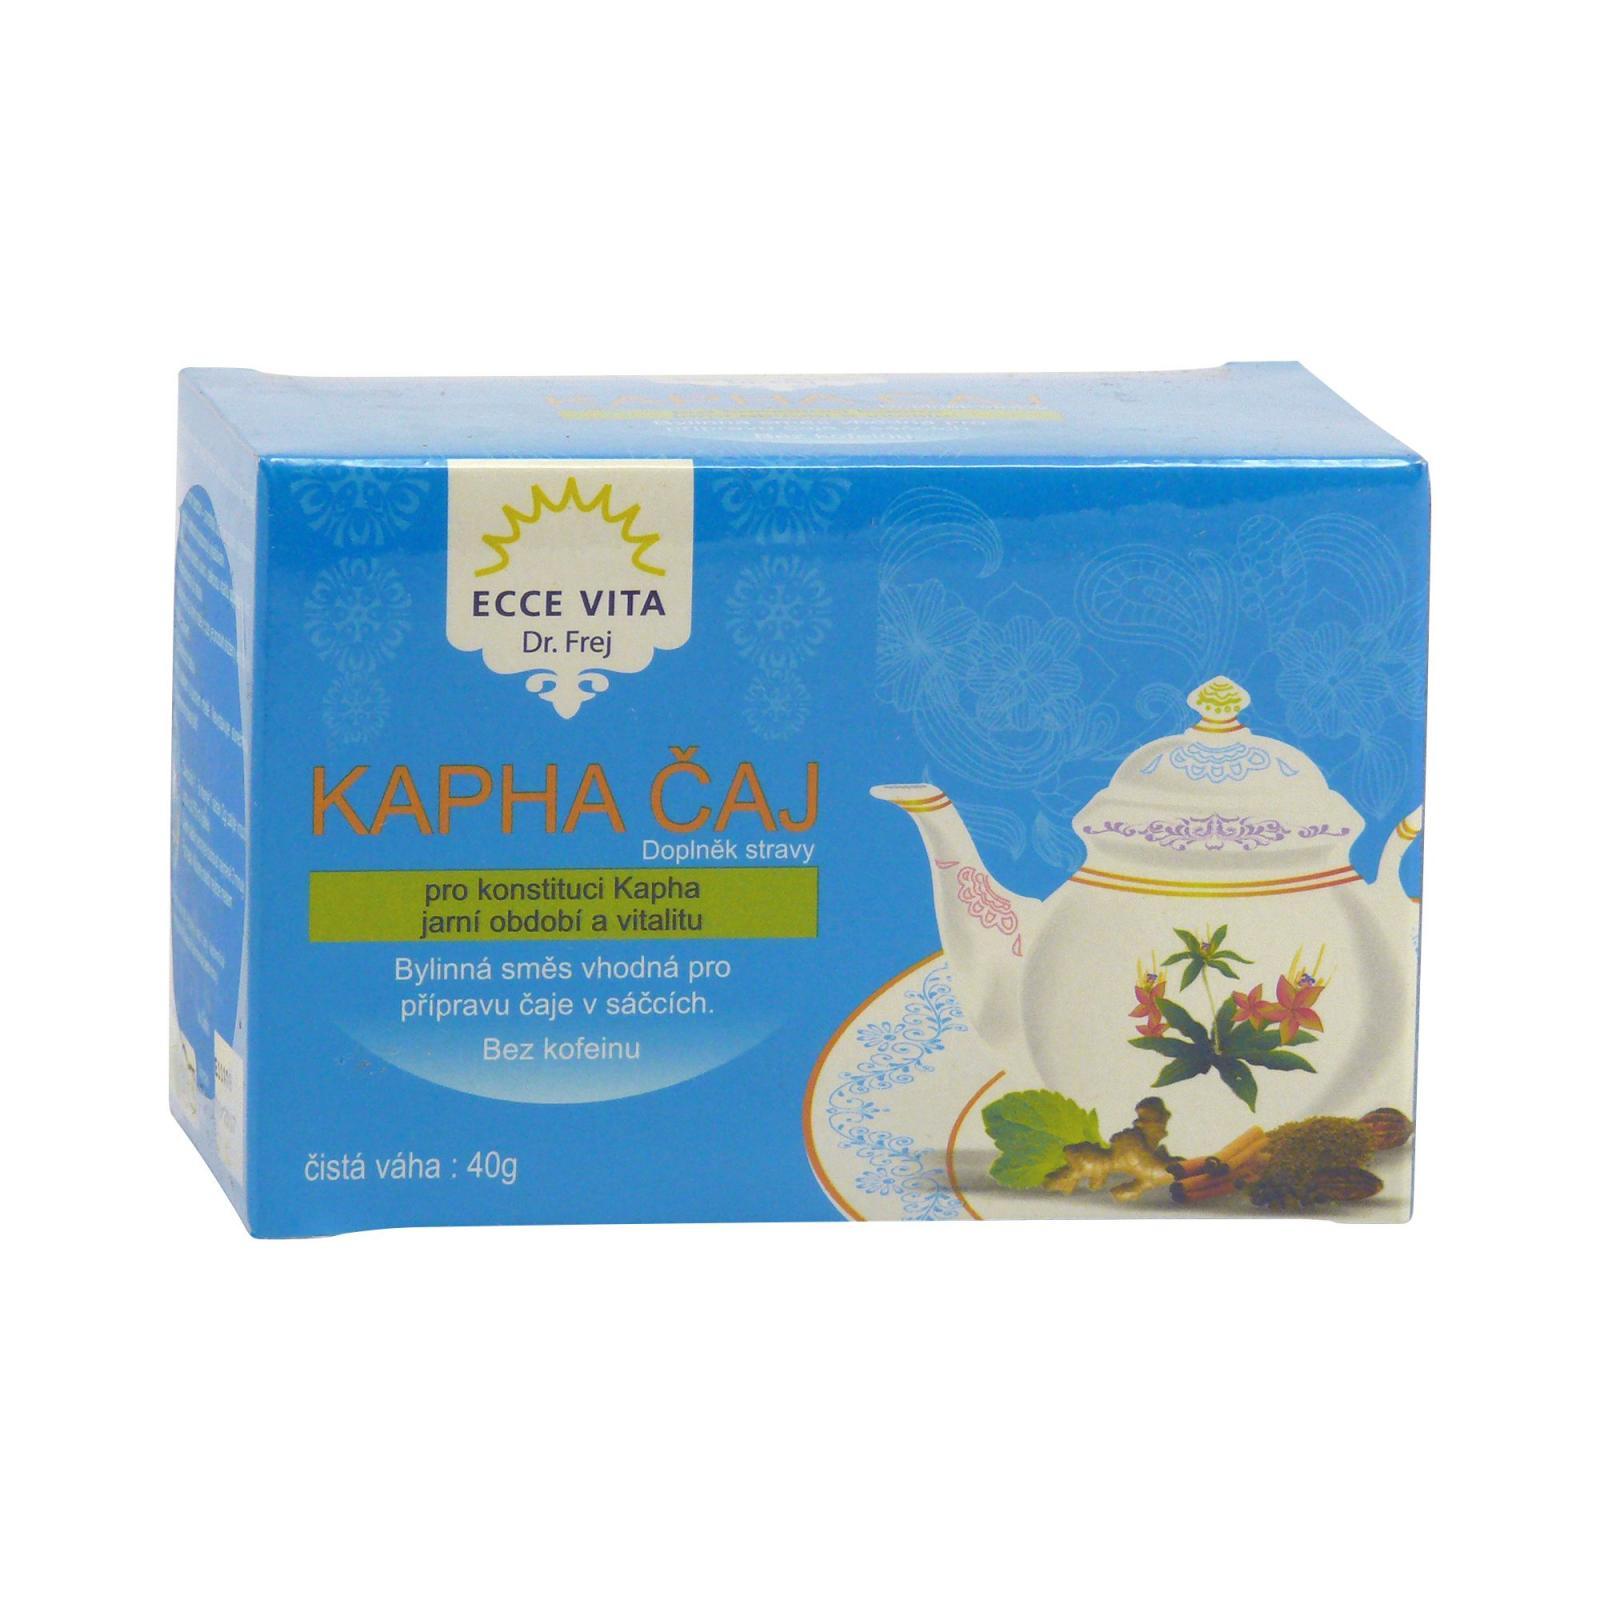 Ecce Vita Kapha čaj, pro jaro, dýchací systém a vitalitu 20 ks, 40 g